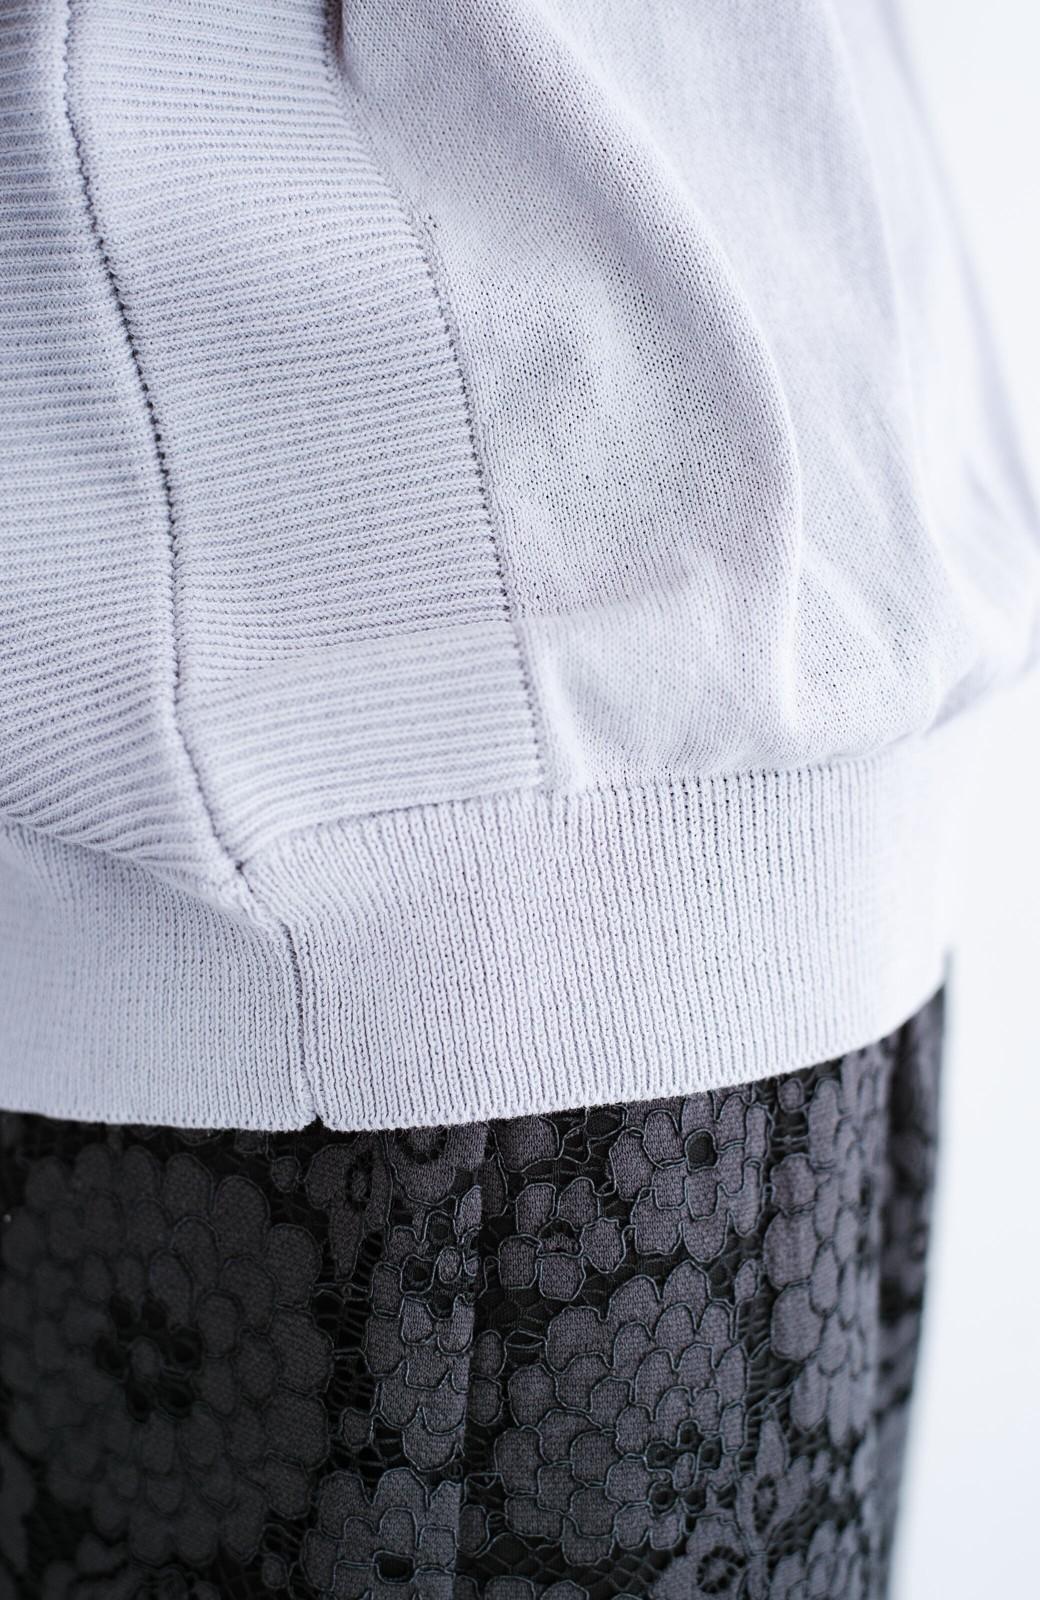 haco! カットソー感覚で着られる 洗えるオトナニットトップス by MAKORI <ライトグレー>の商品写真5